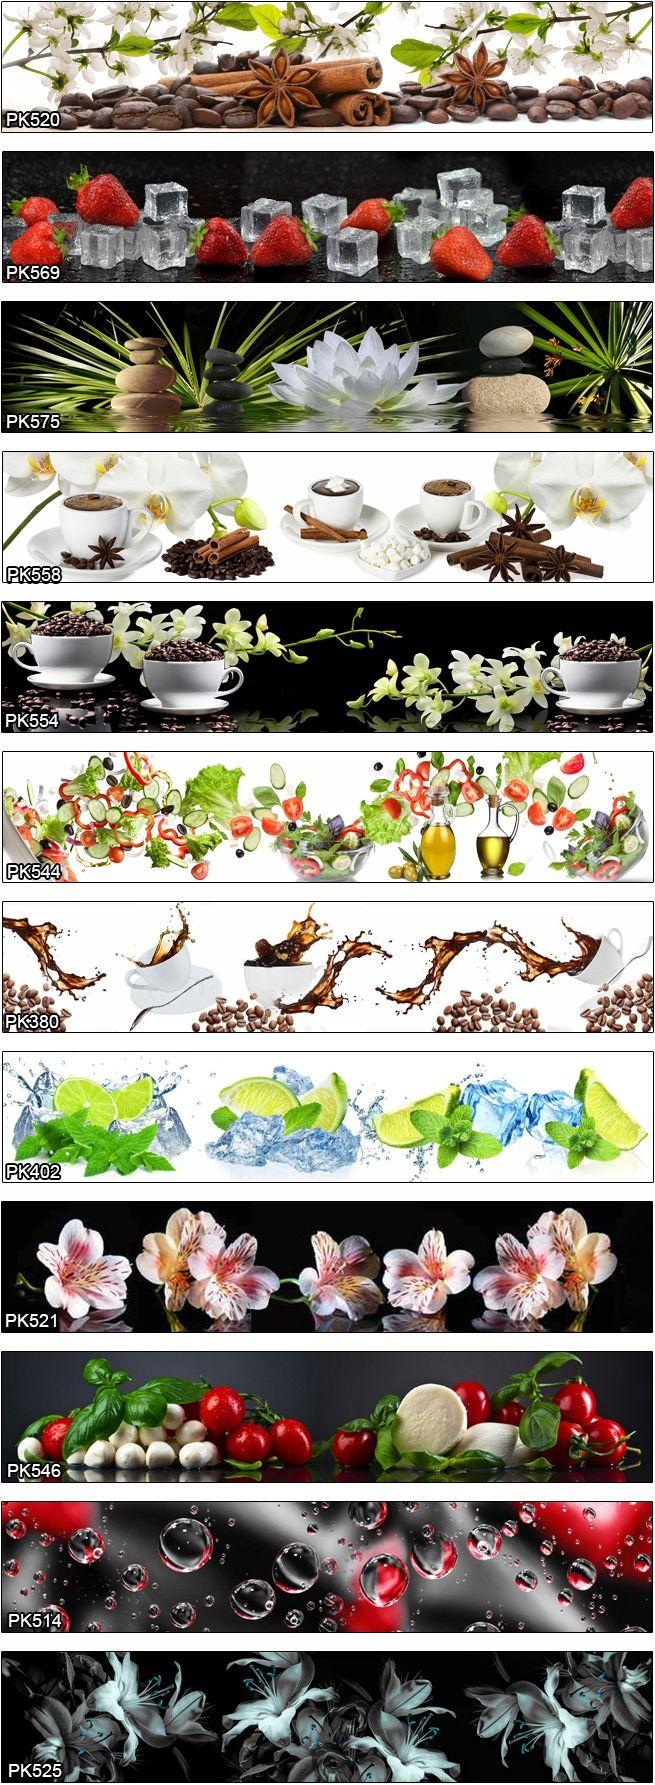 Szklo Hartowane Do Kuchni Panel Szklany Fotolia 7911228131 Allegro Pl Pattern Art Pattern Art